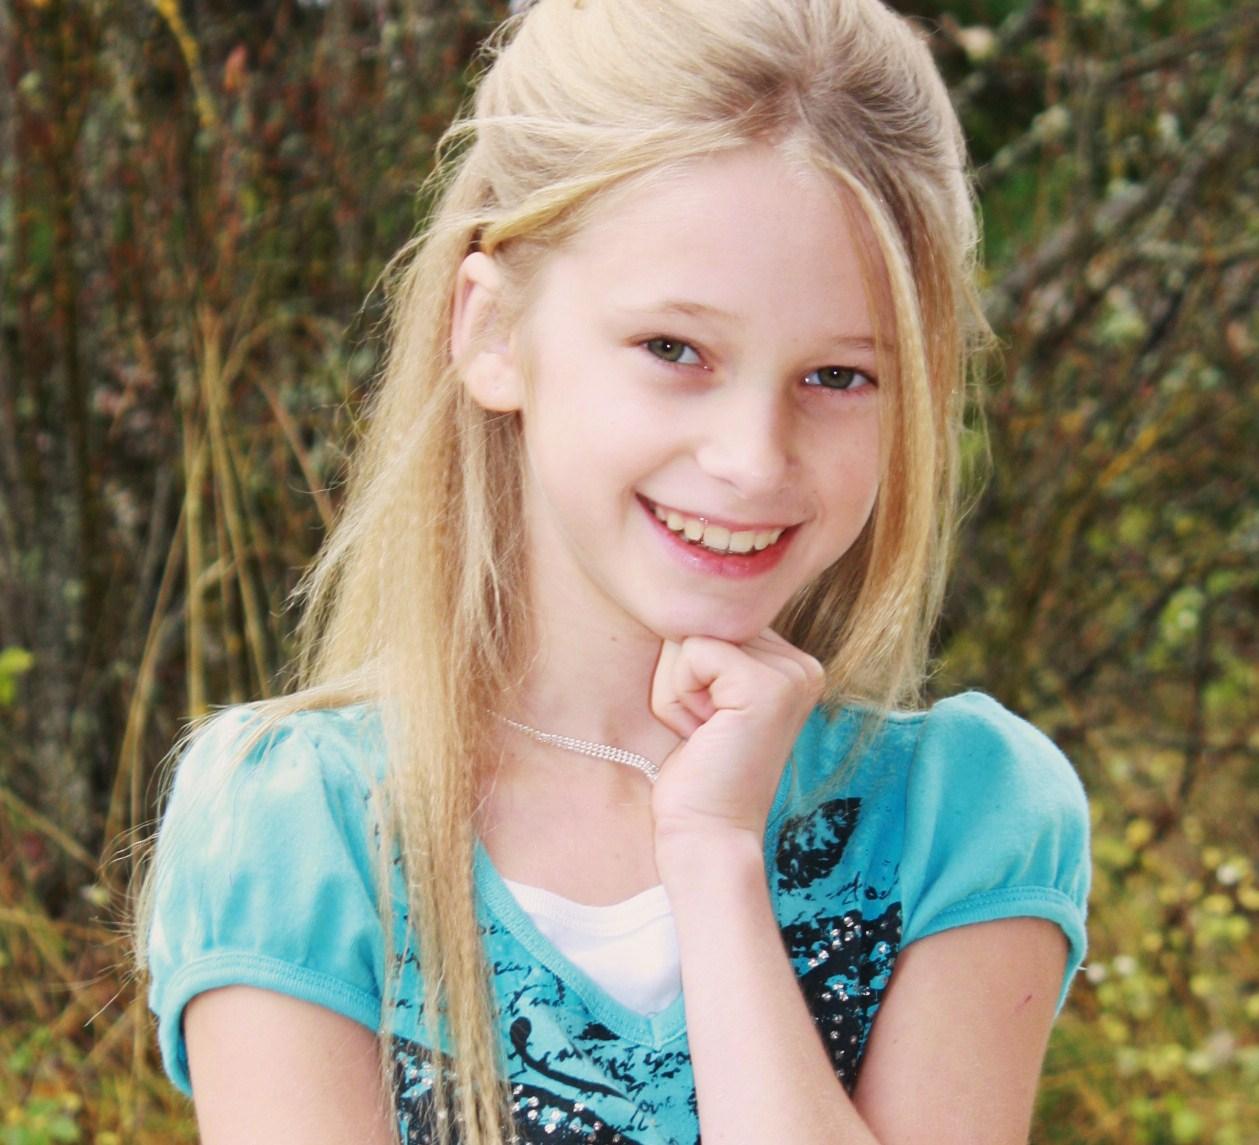 girl 13 year old